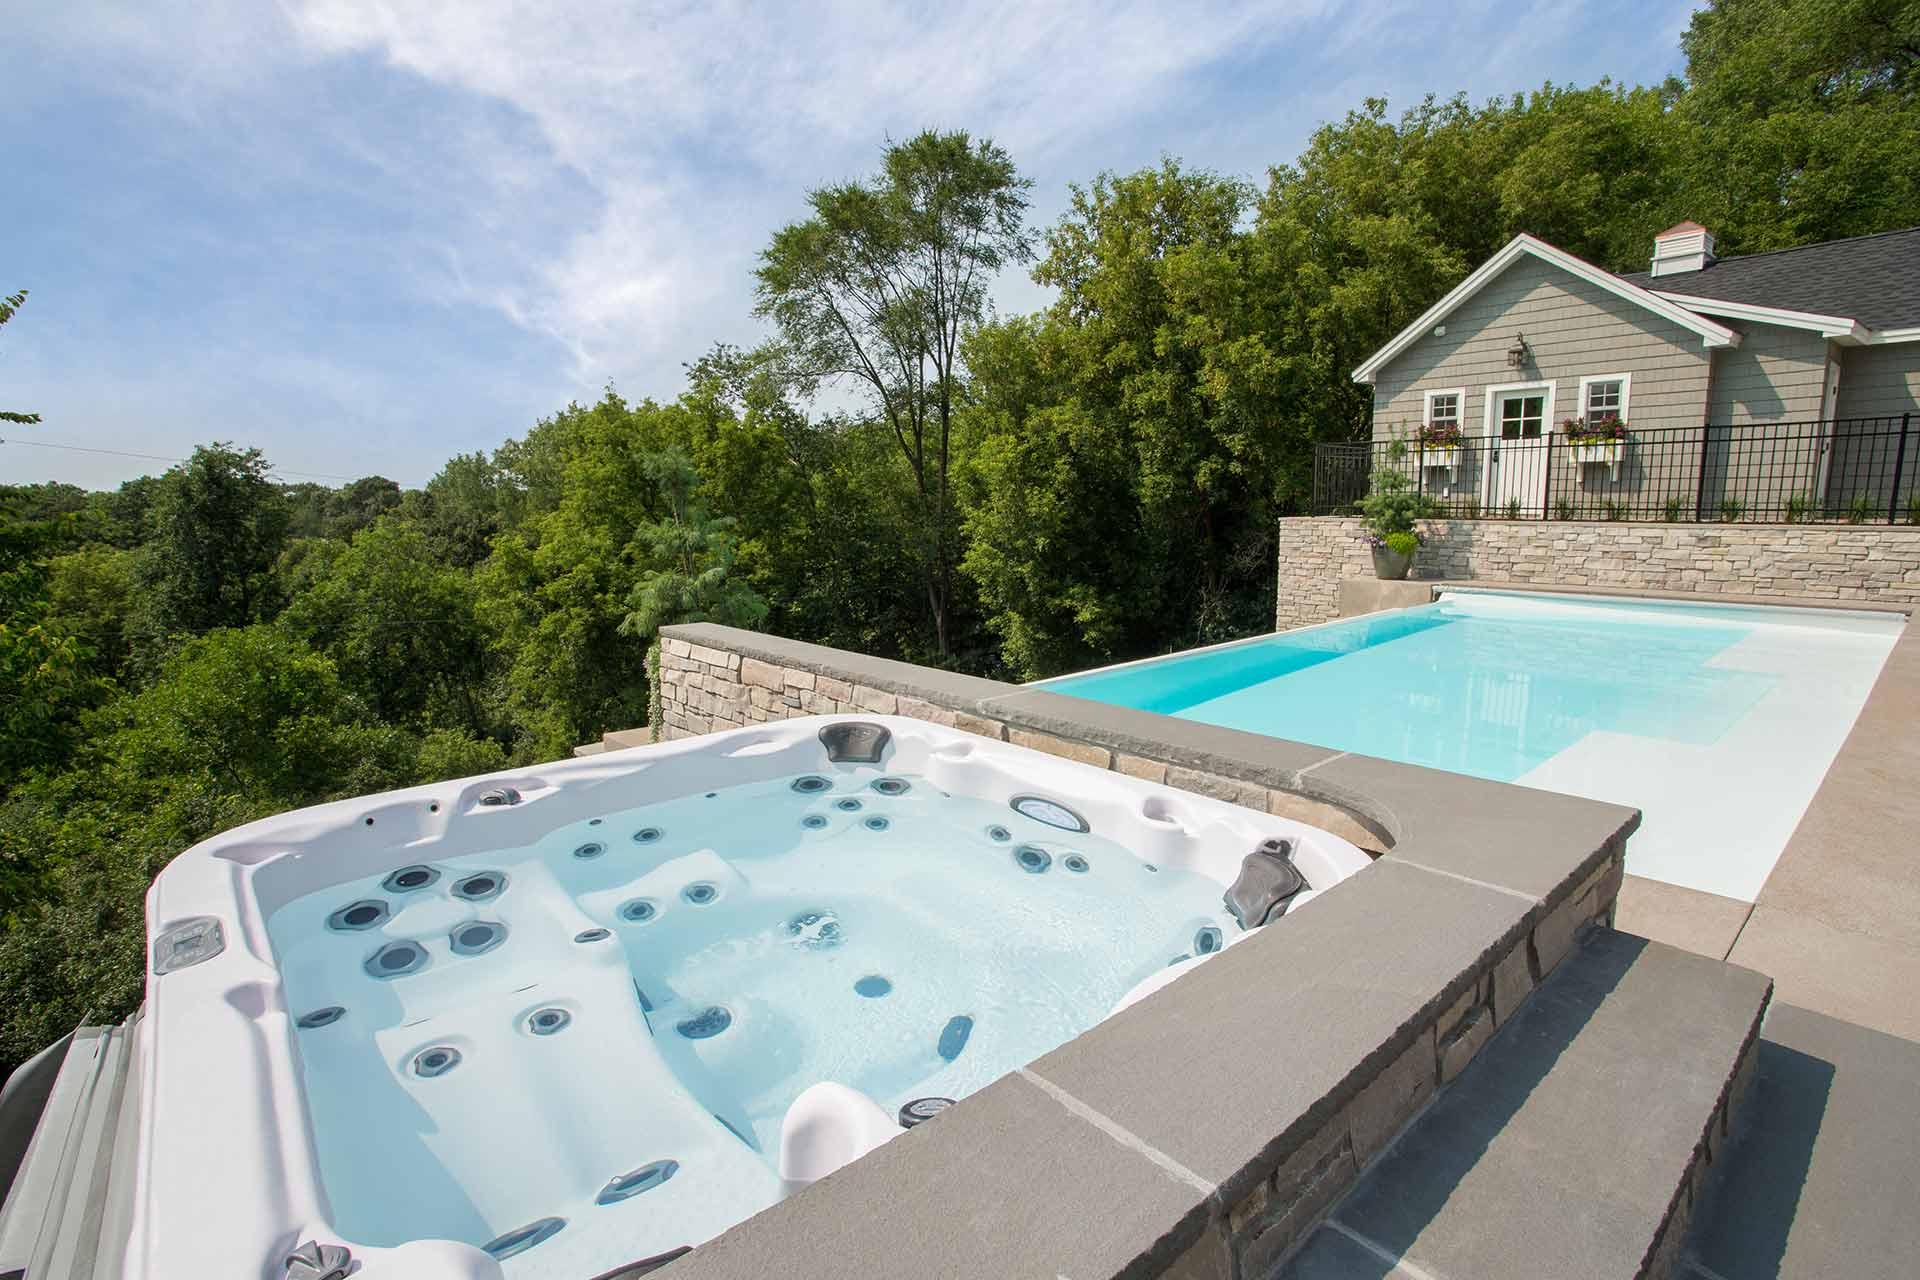 Whirlpool - Außenwhirlpool - Gartenwhirlpool - Whirlpool & Living